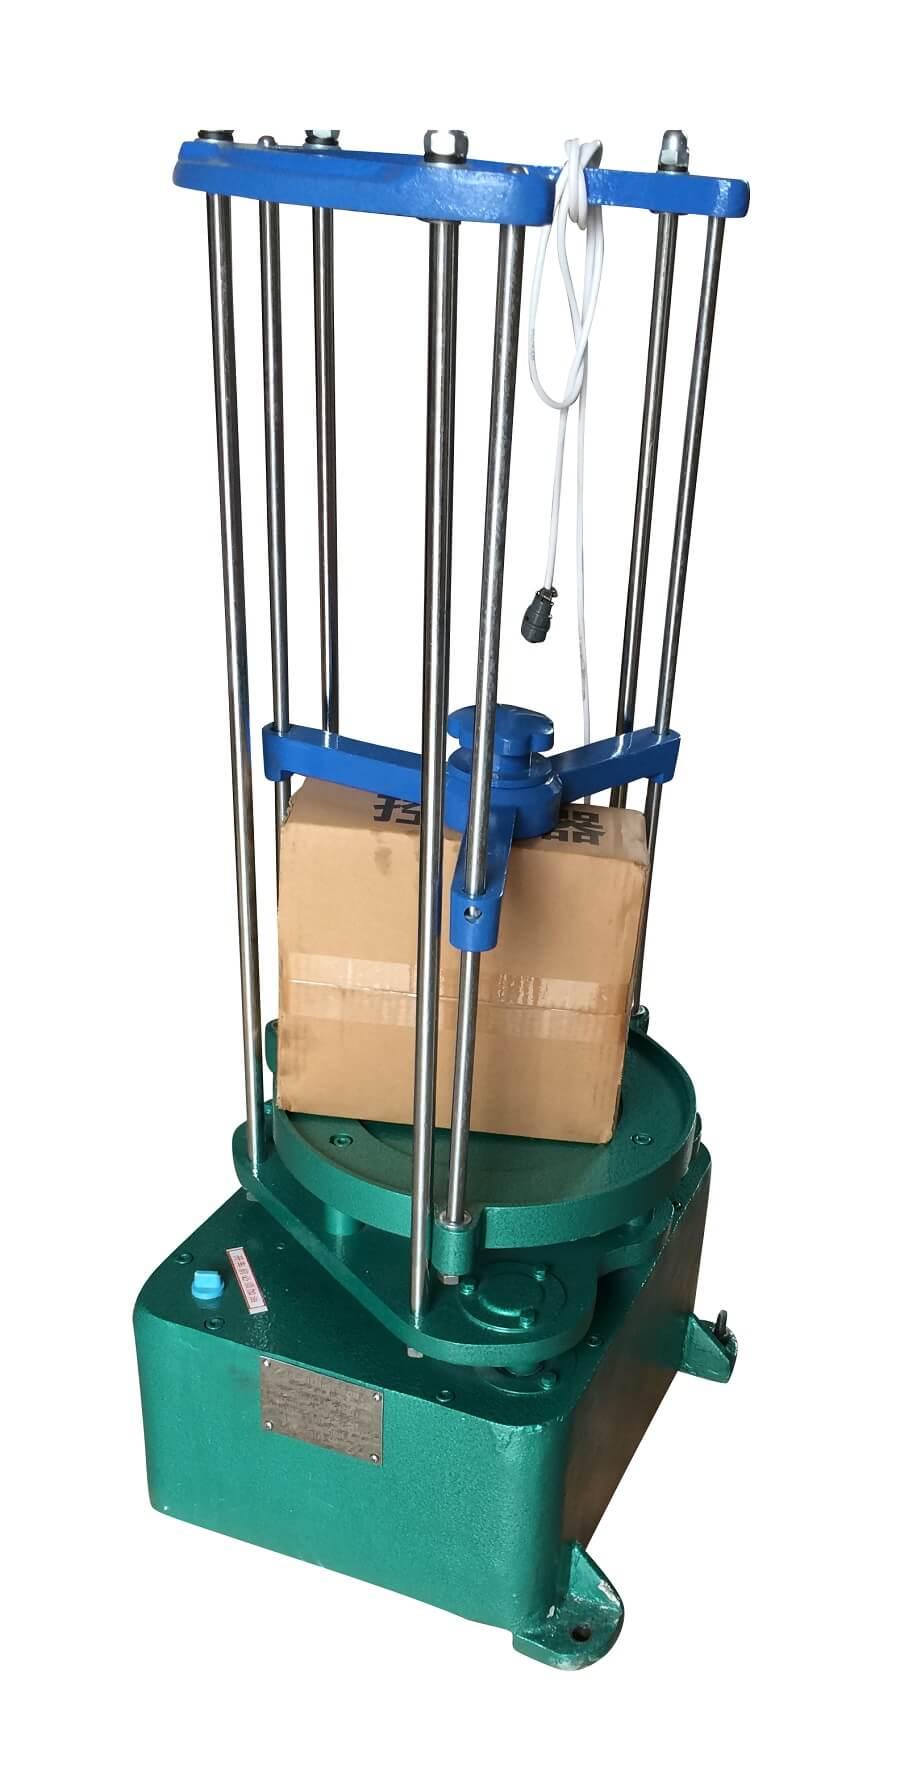 vibratory sieve shaker (2)